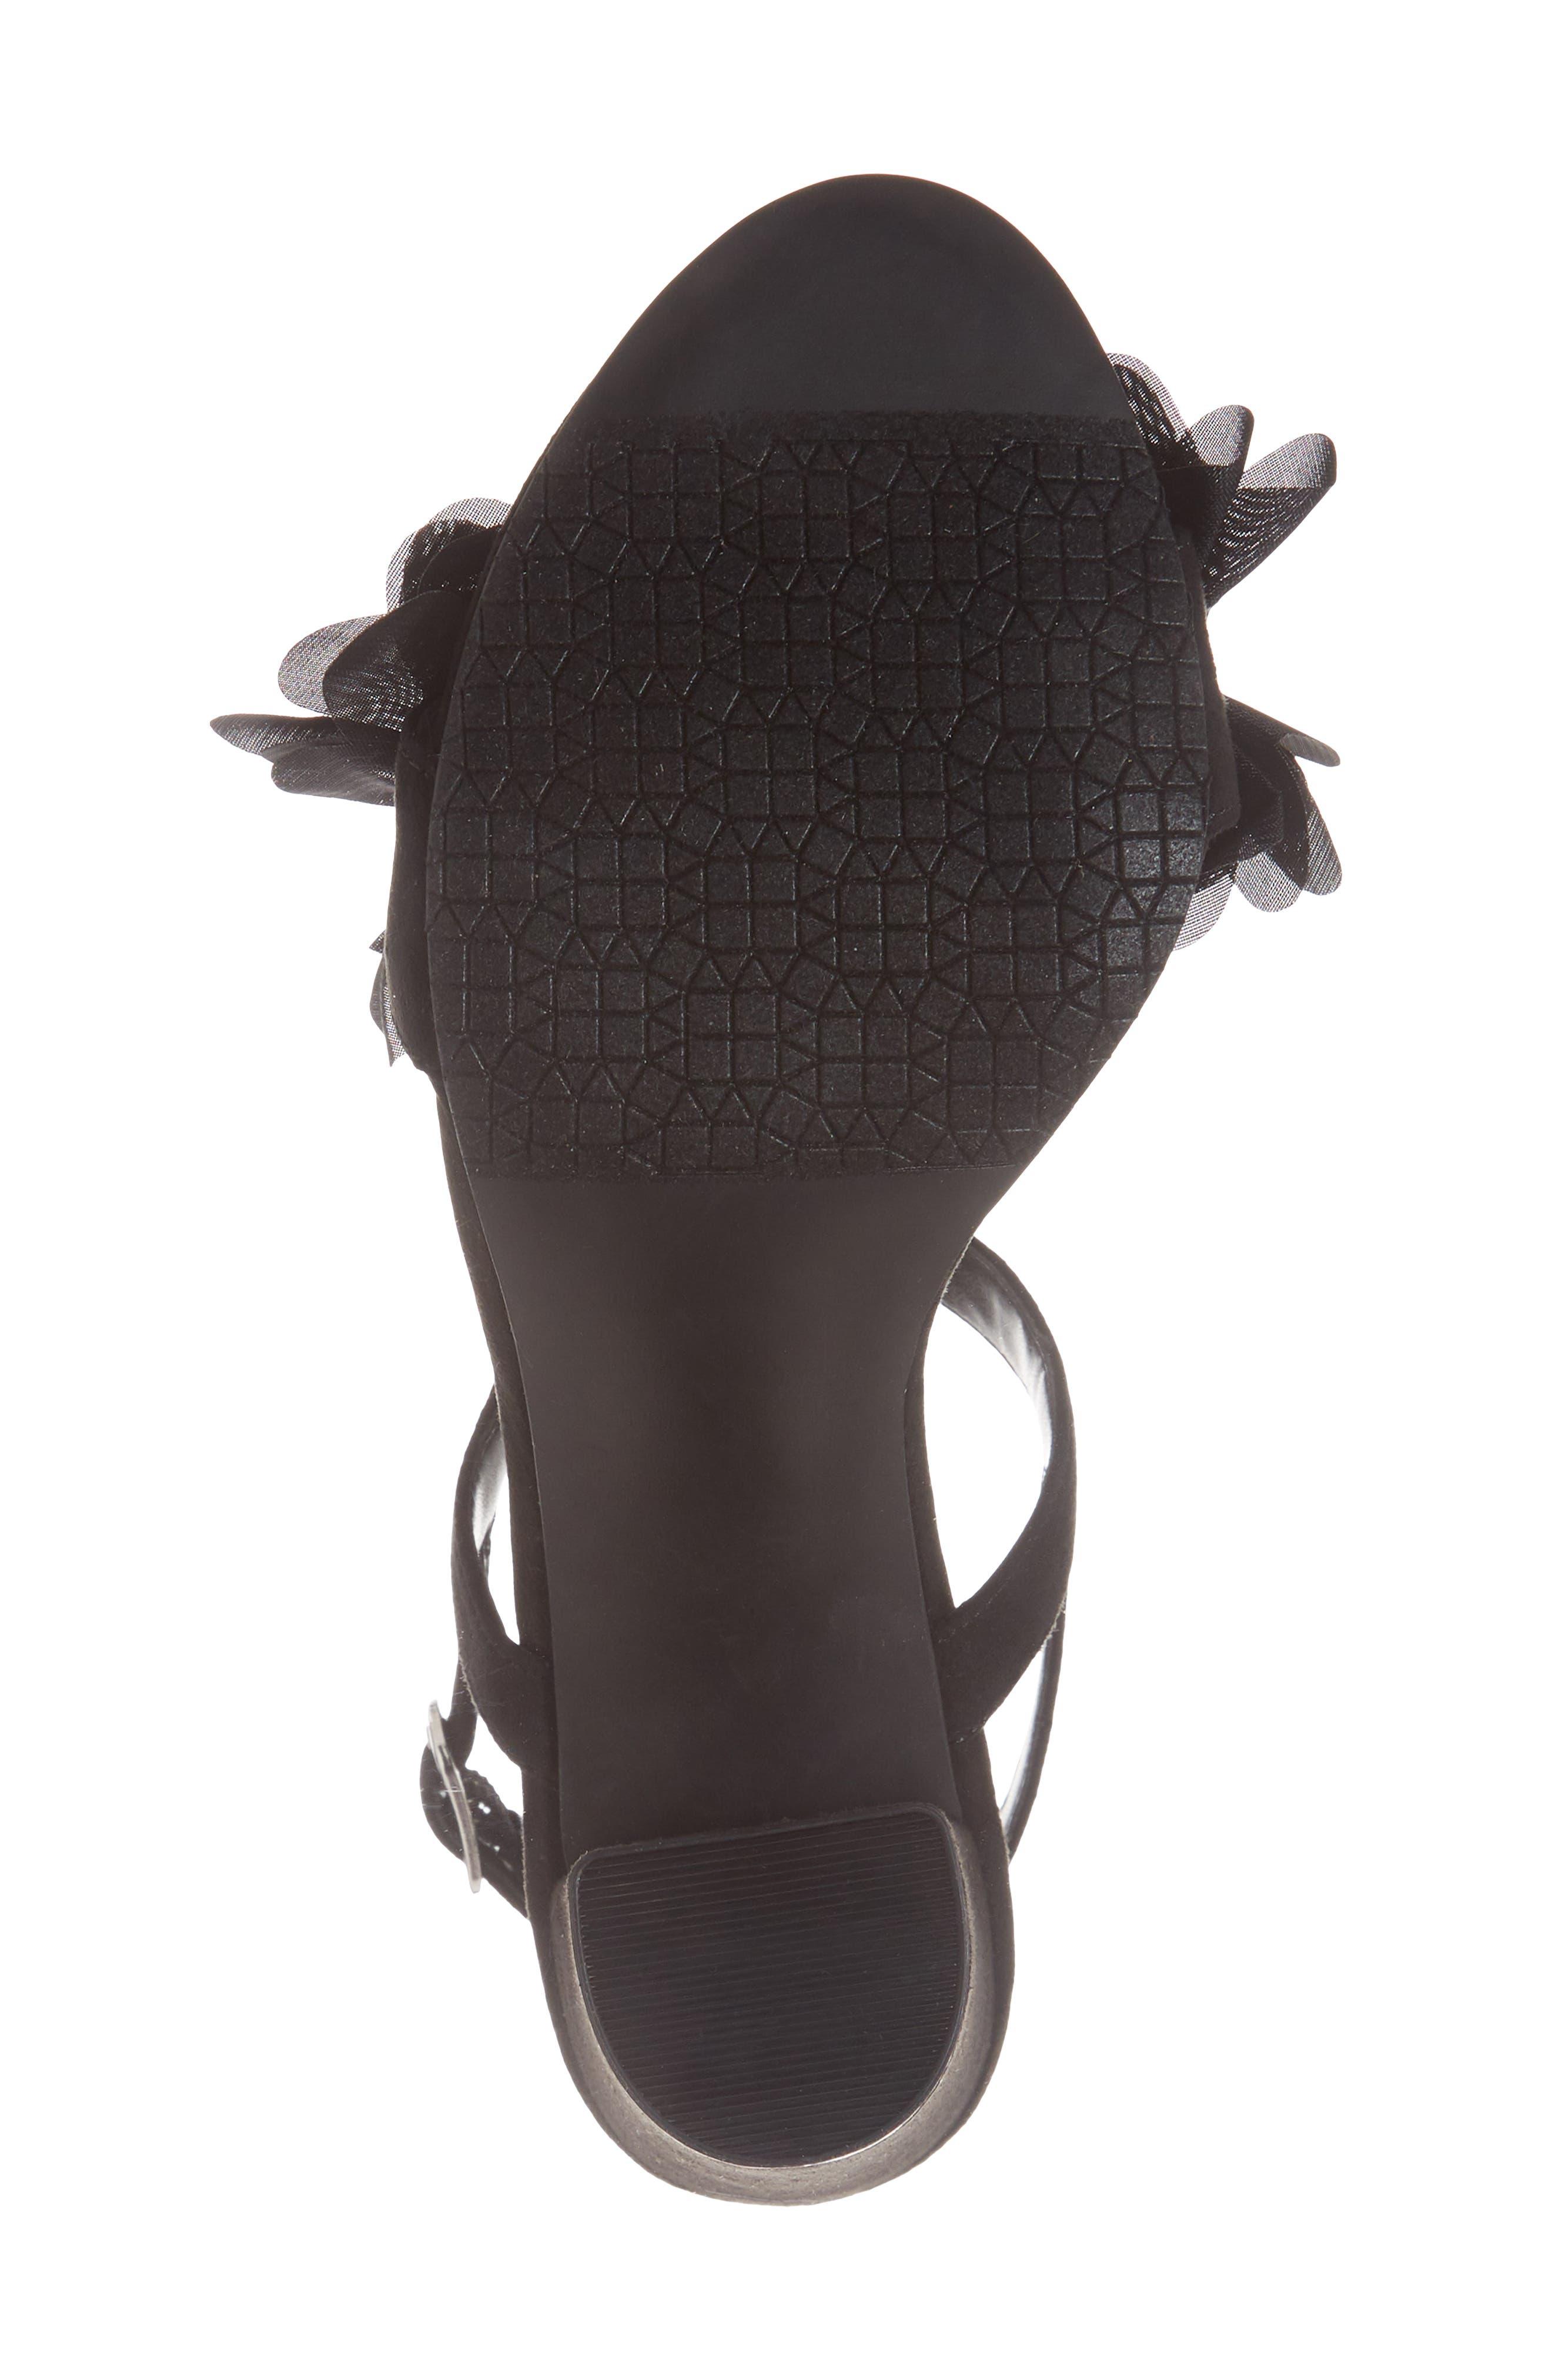 Lula Block Heel Slingback Sandal,                             Alternate thumbnail 6, color,                             Black Flowers Fabric